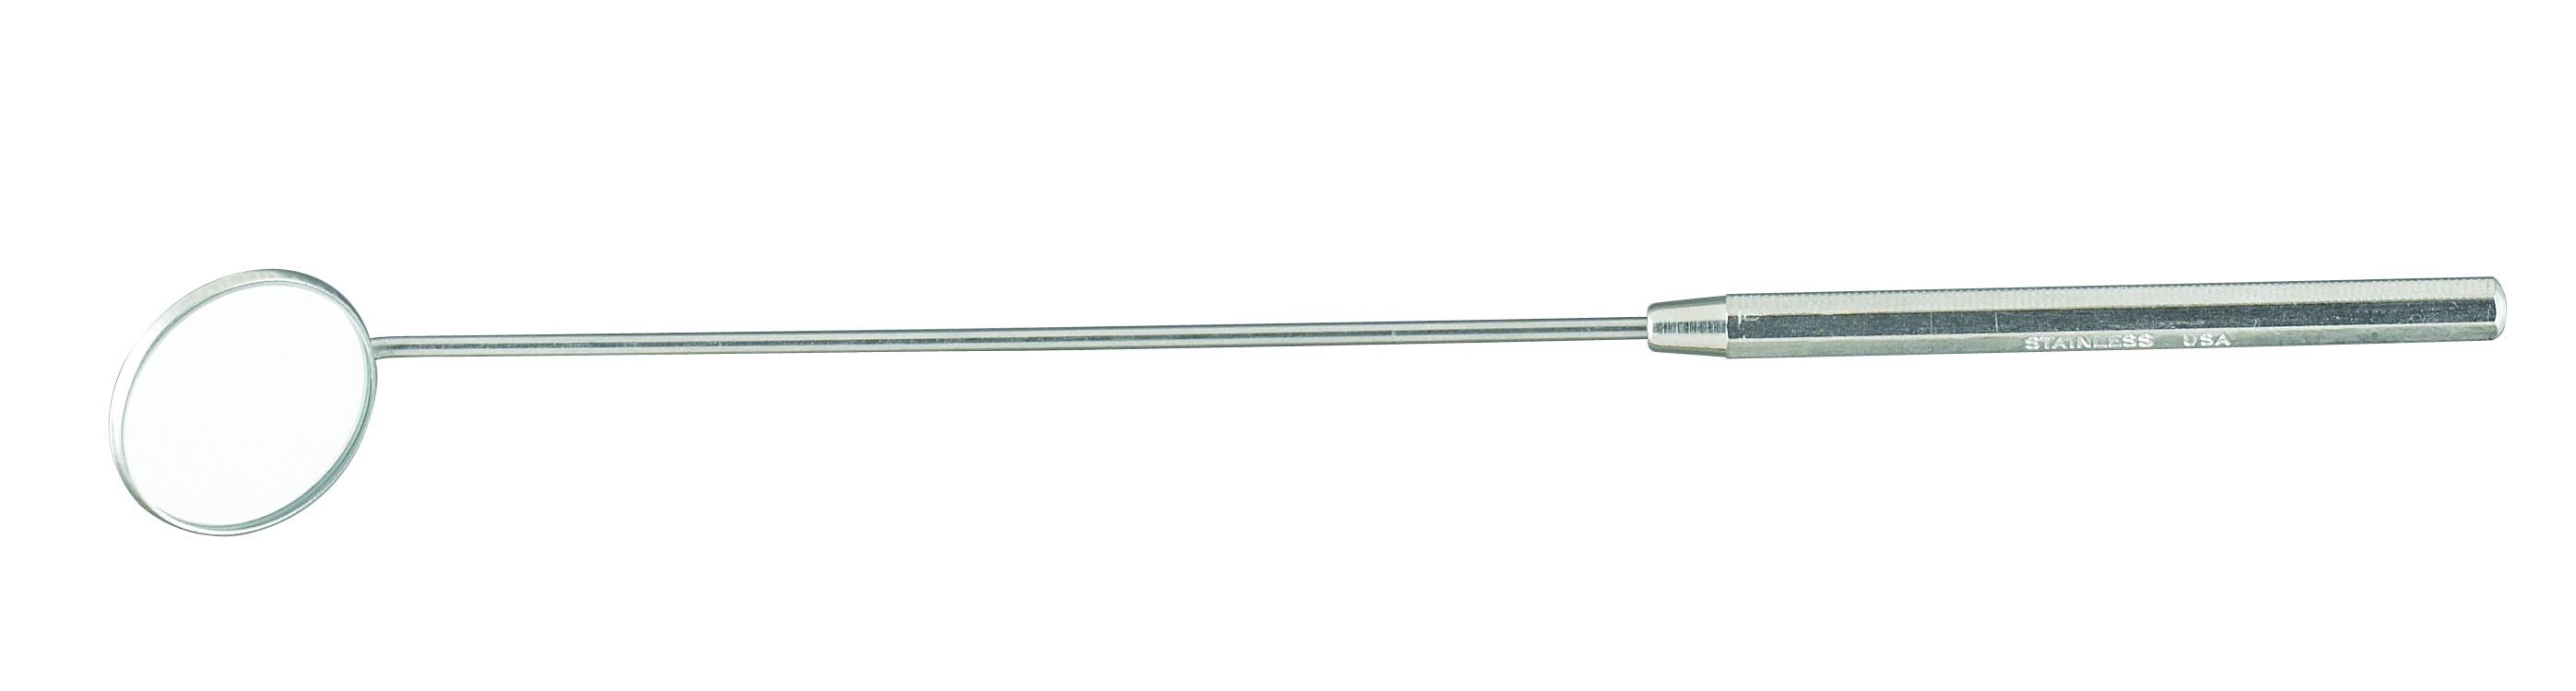 laryngeal-mirror-size-5-with-octagon-threaded-handle-24-mm-23-14-5-miltex.jpg